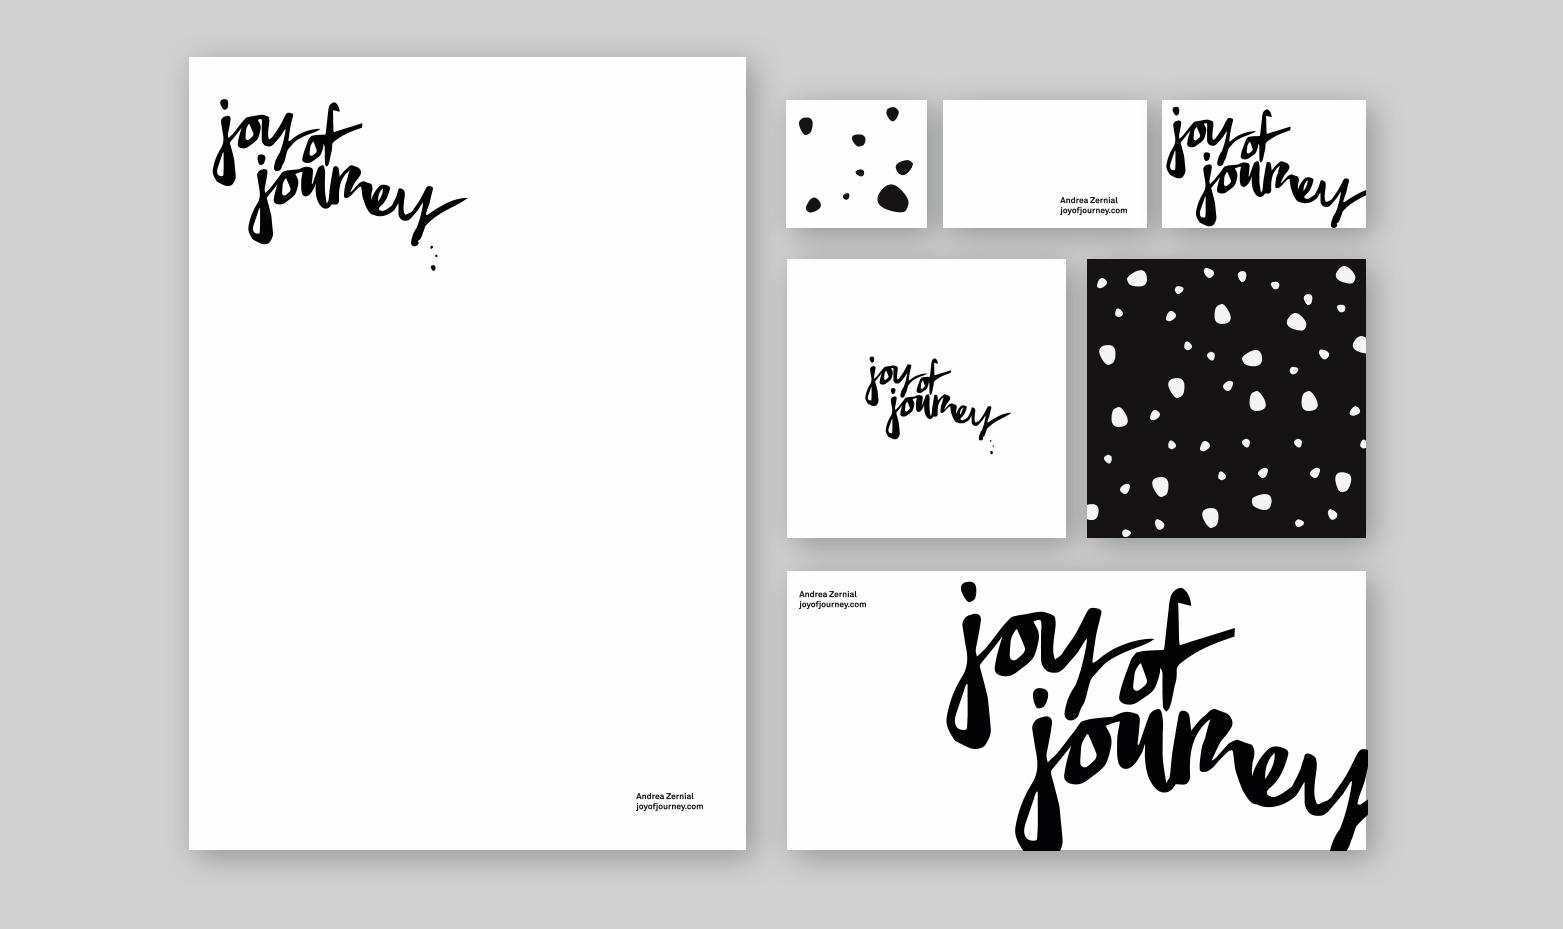 JoyOfJourney_Projektblatt